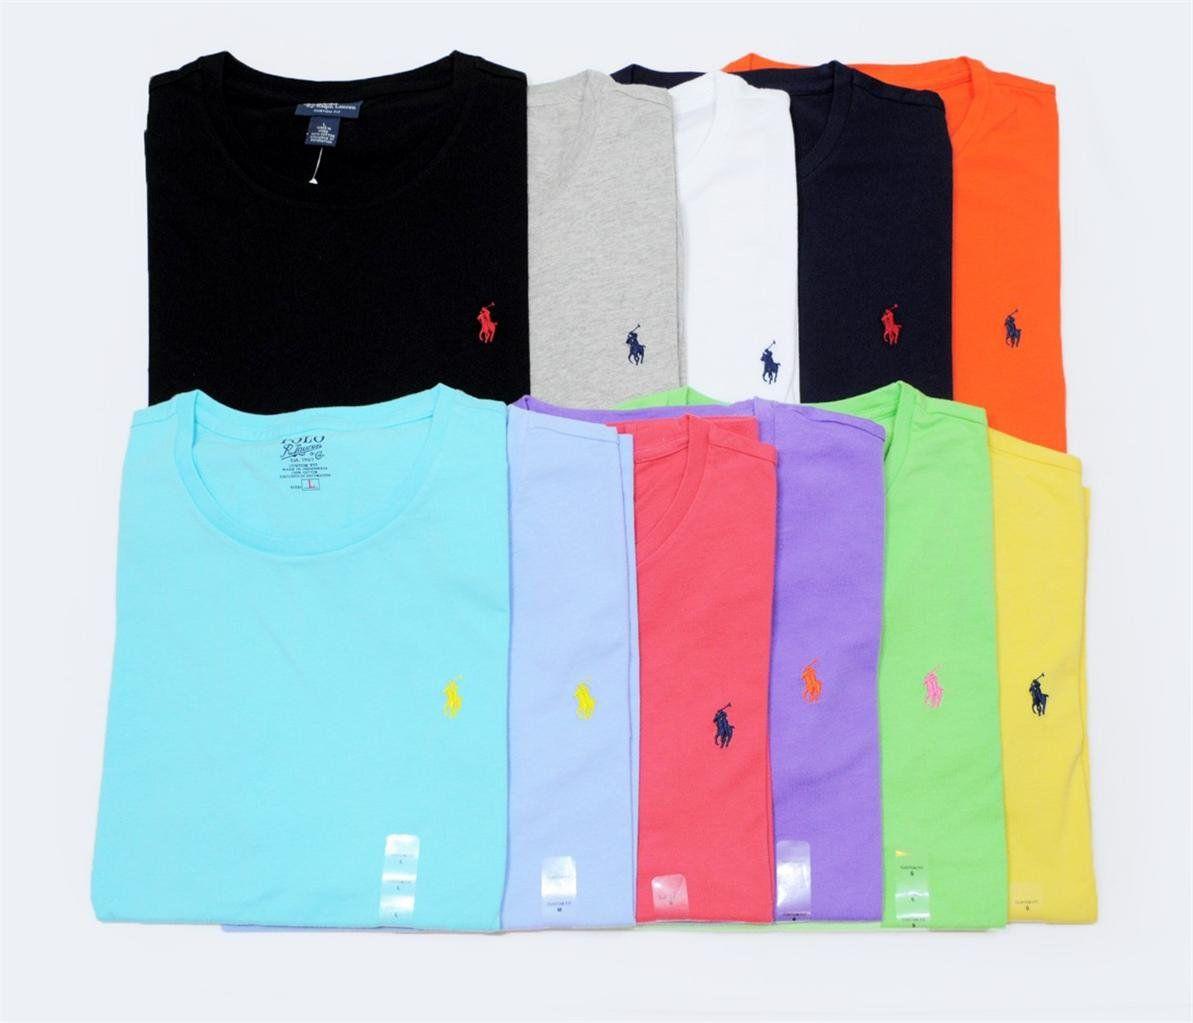 8bdf862eb6b01 travismartinek s save of NWT Ralph Lauren POLO Mens Cotton T-shirt TEE  CUSTOM FIT New! on Wanelo